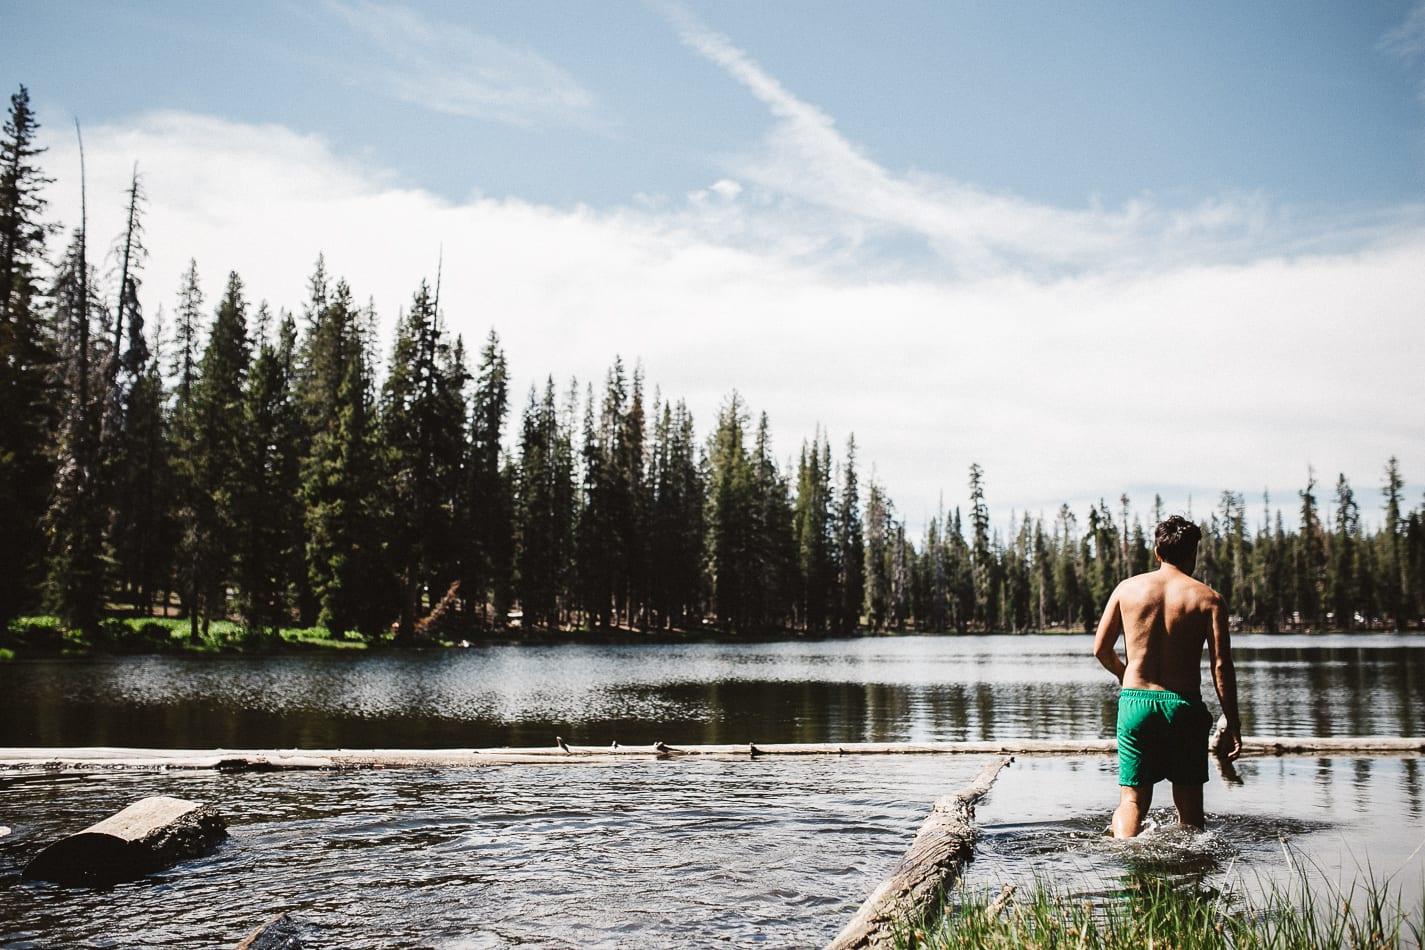 mount-lassen-california-adventure-lifestyle-photorapher-5